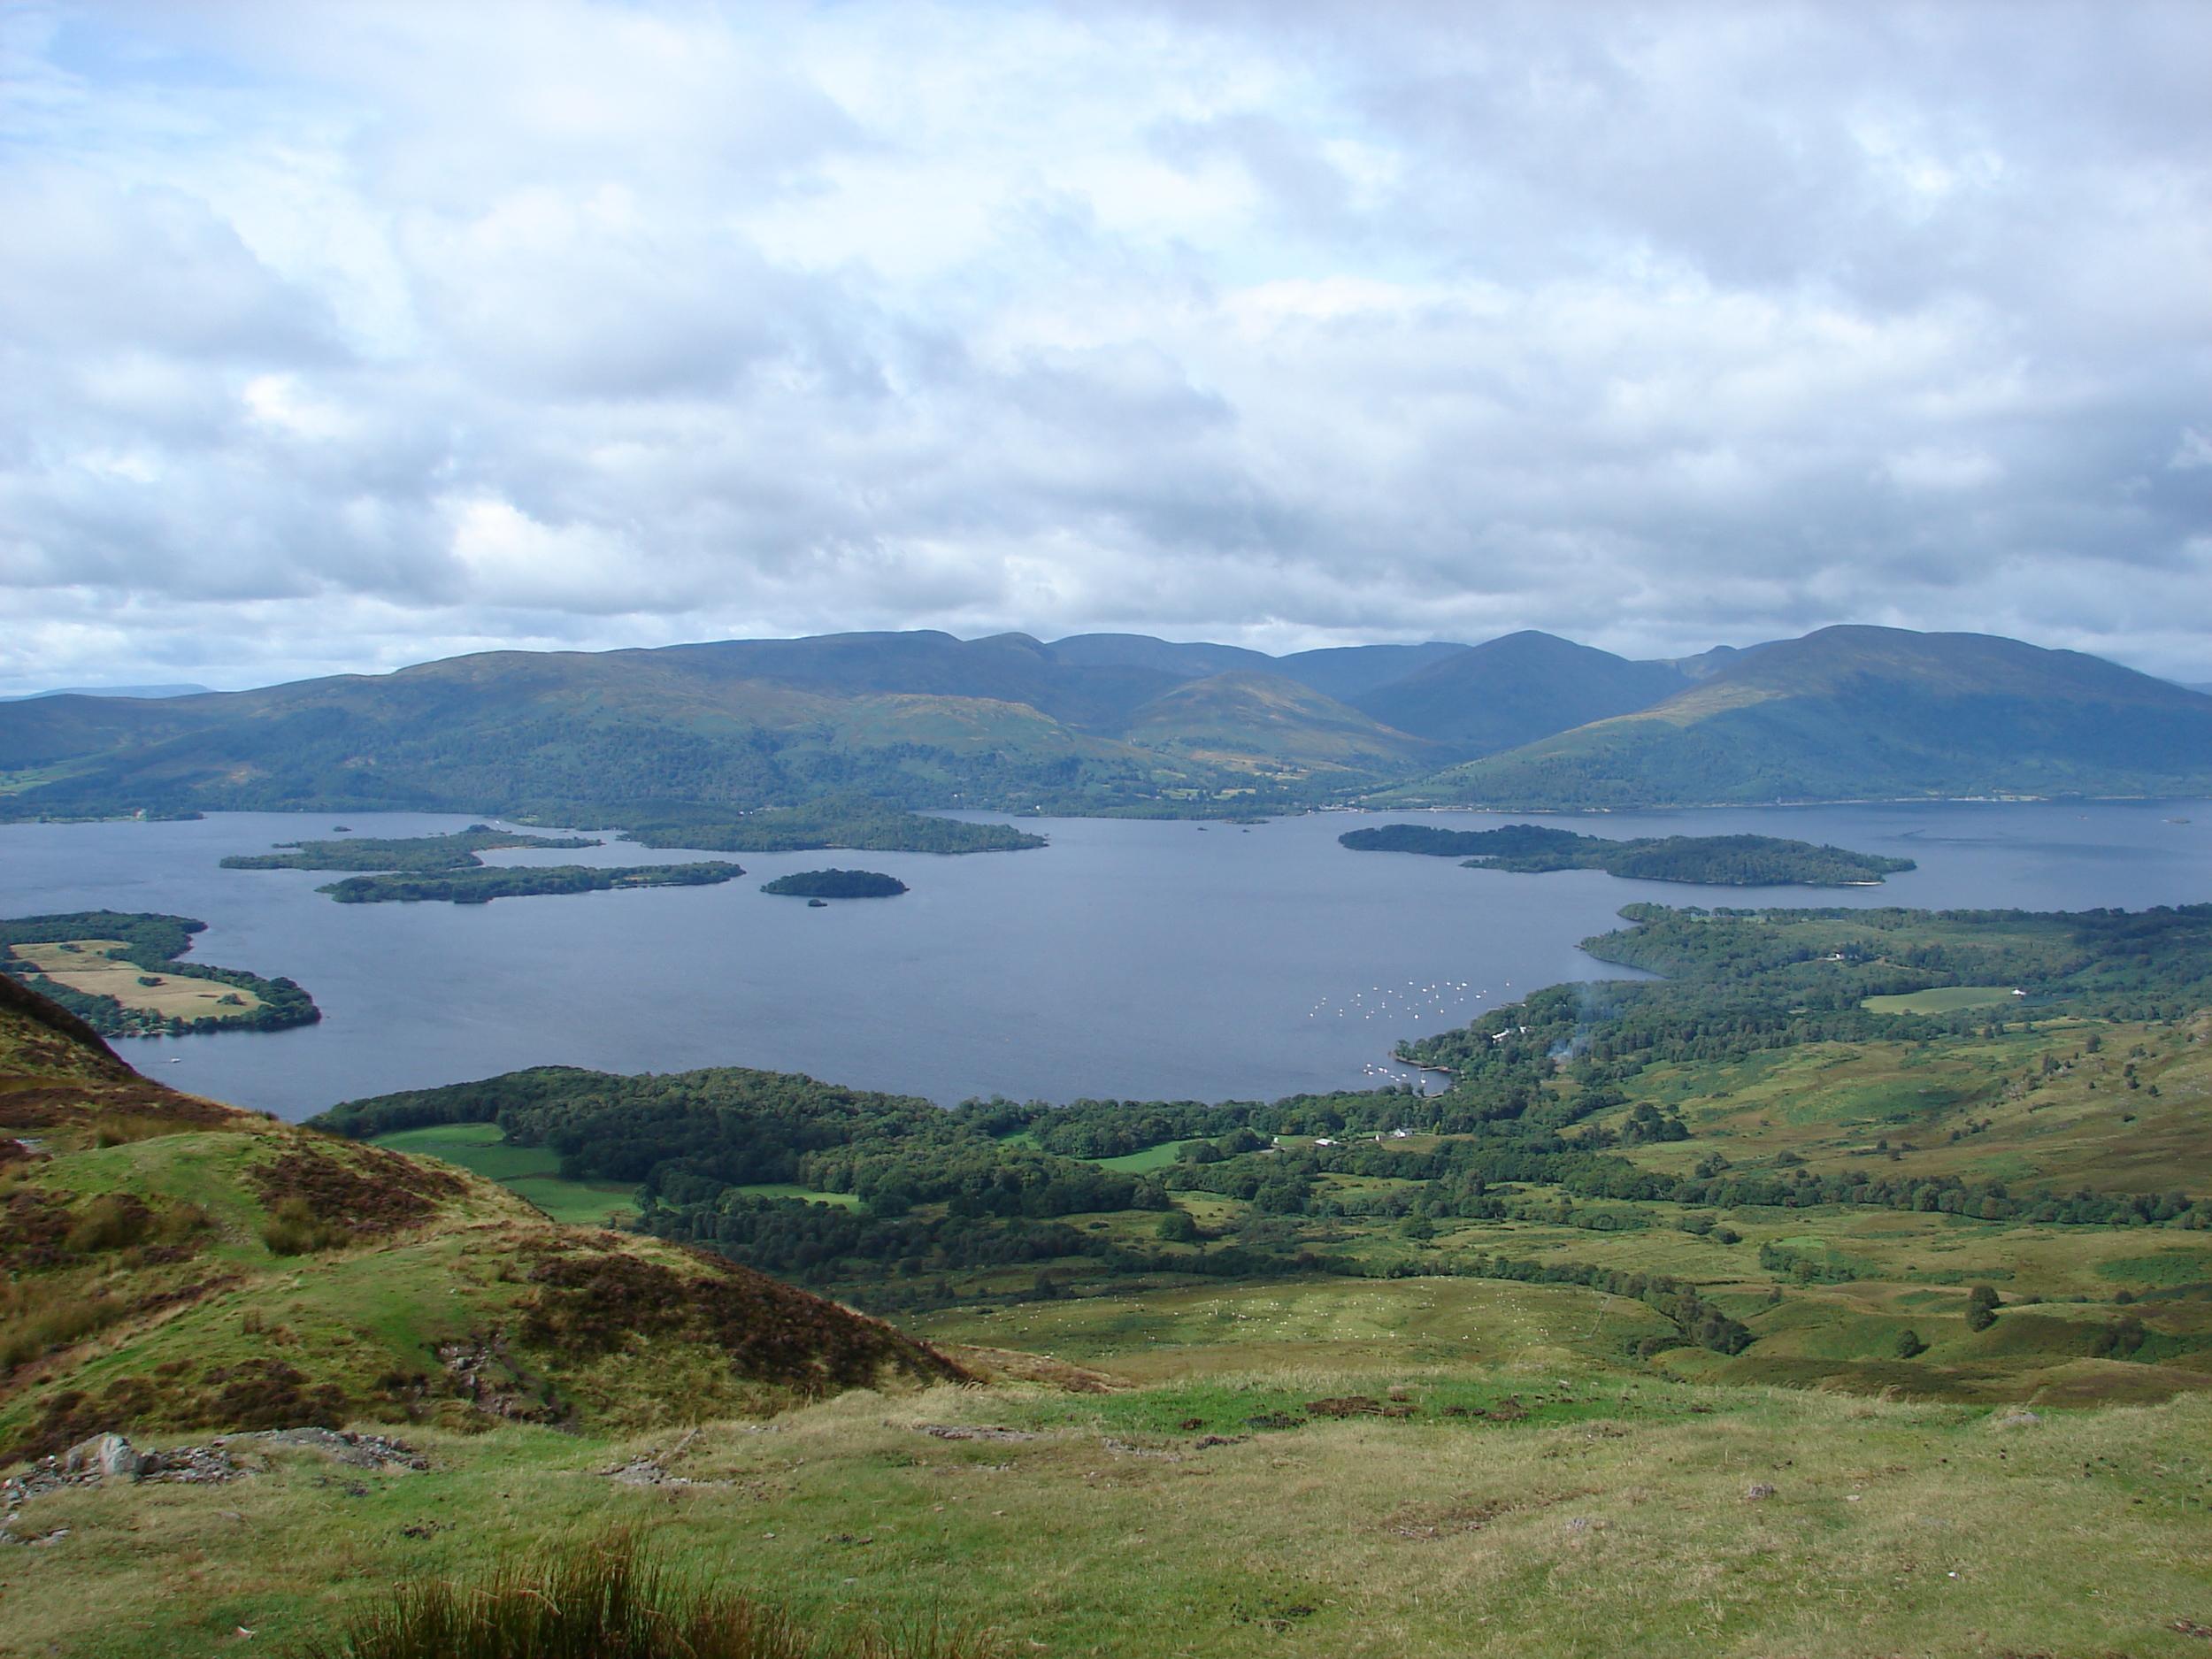 """Bonnie"" Loch Lomond is the largest lake in Scotland."